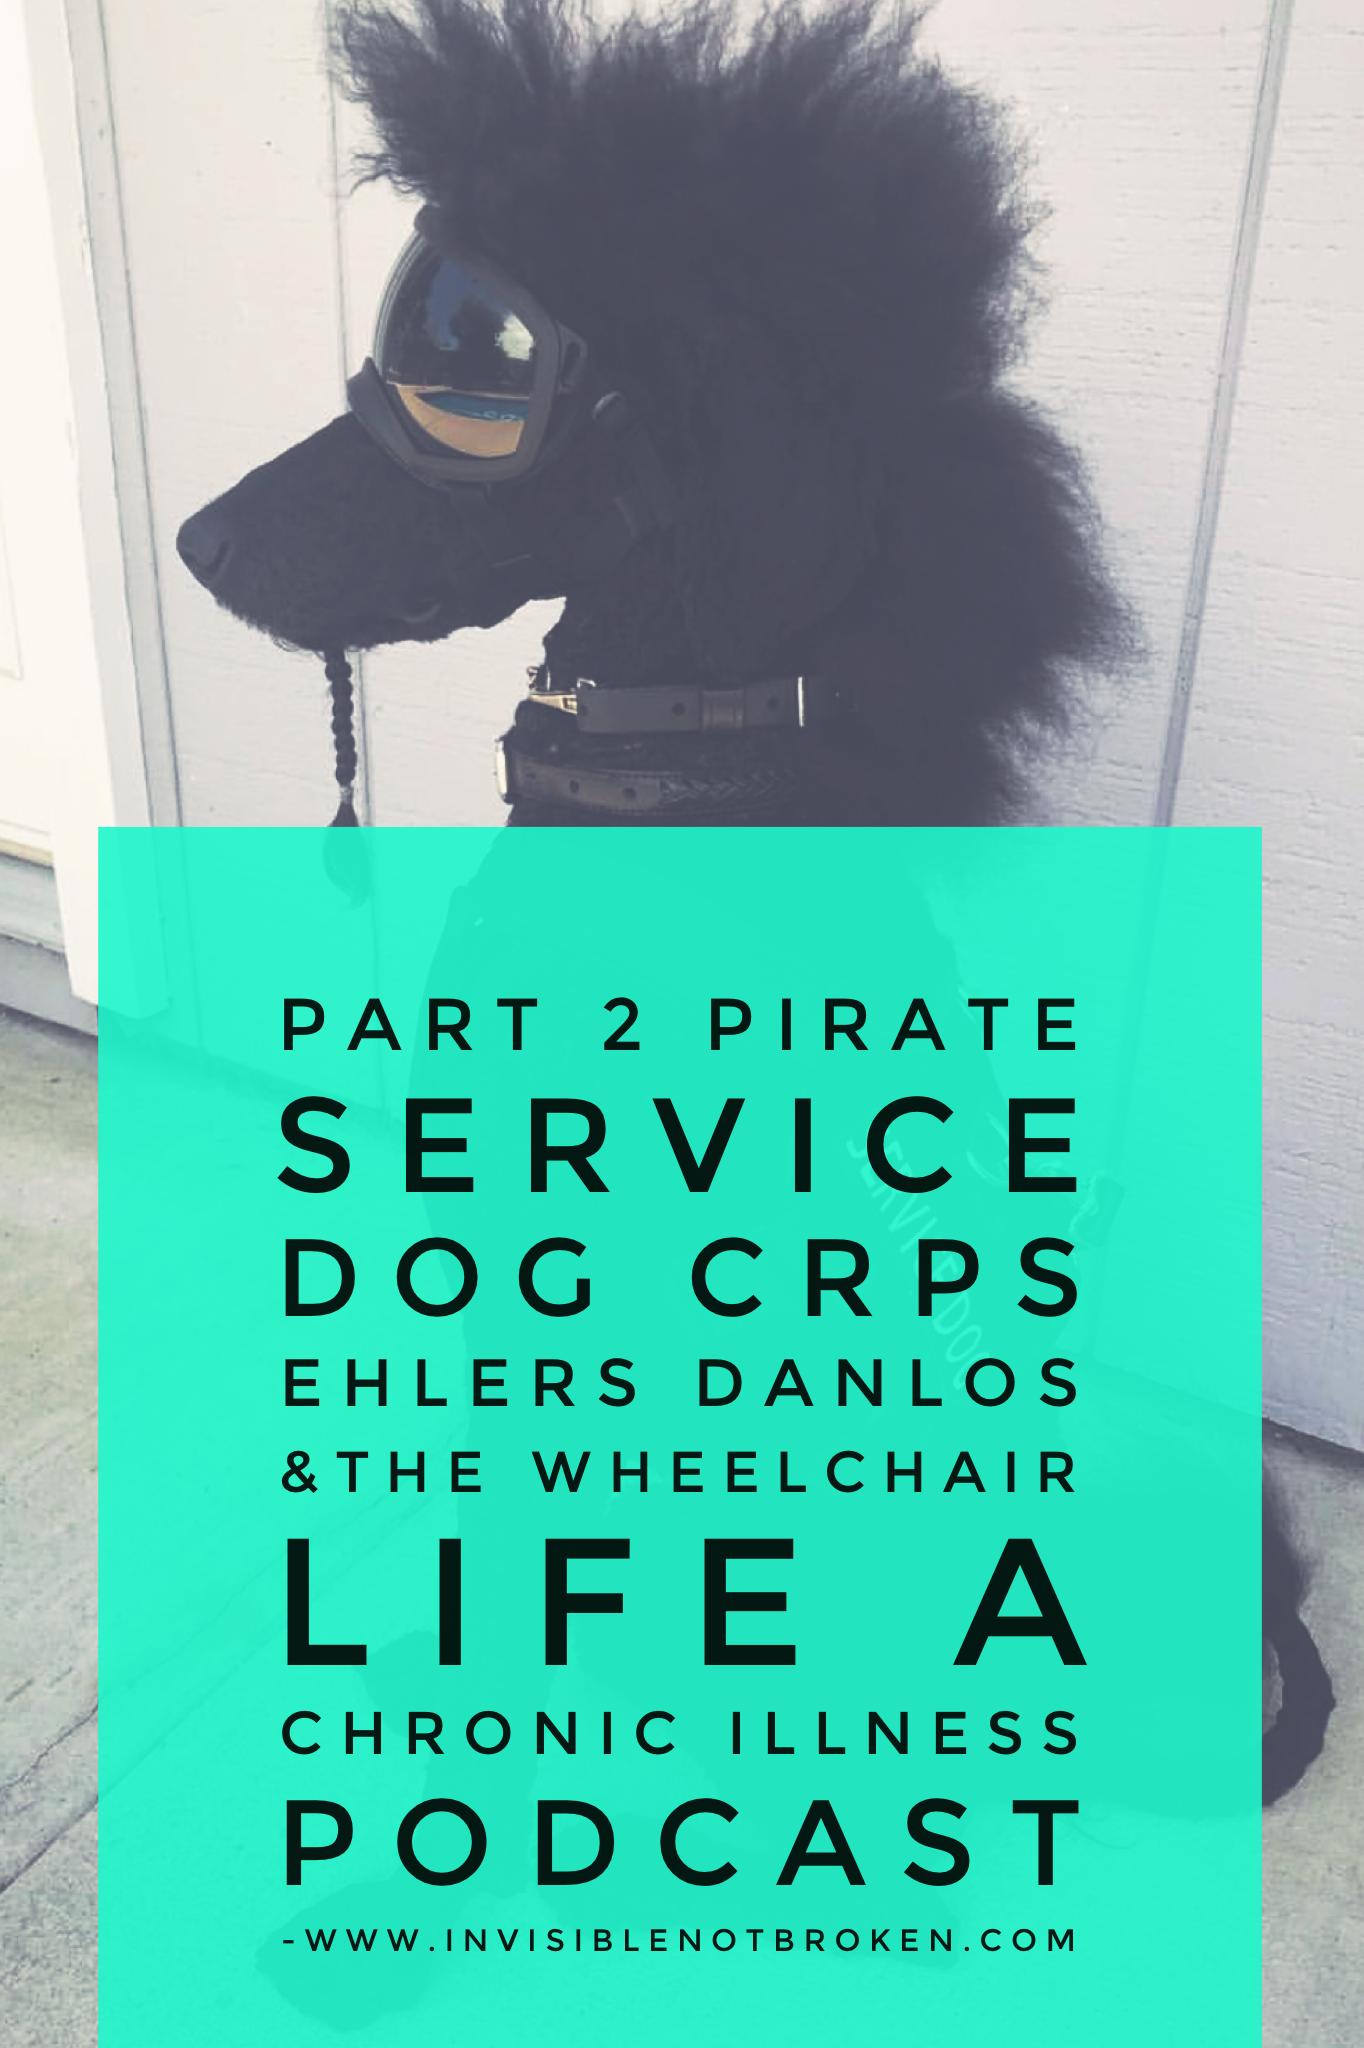 Sirius Black Pirate Service Dog, Wheelchair Life, Ehlers Danlos, CRPS A Chronic Illness Podcast